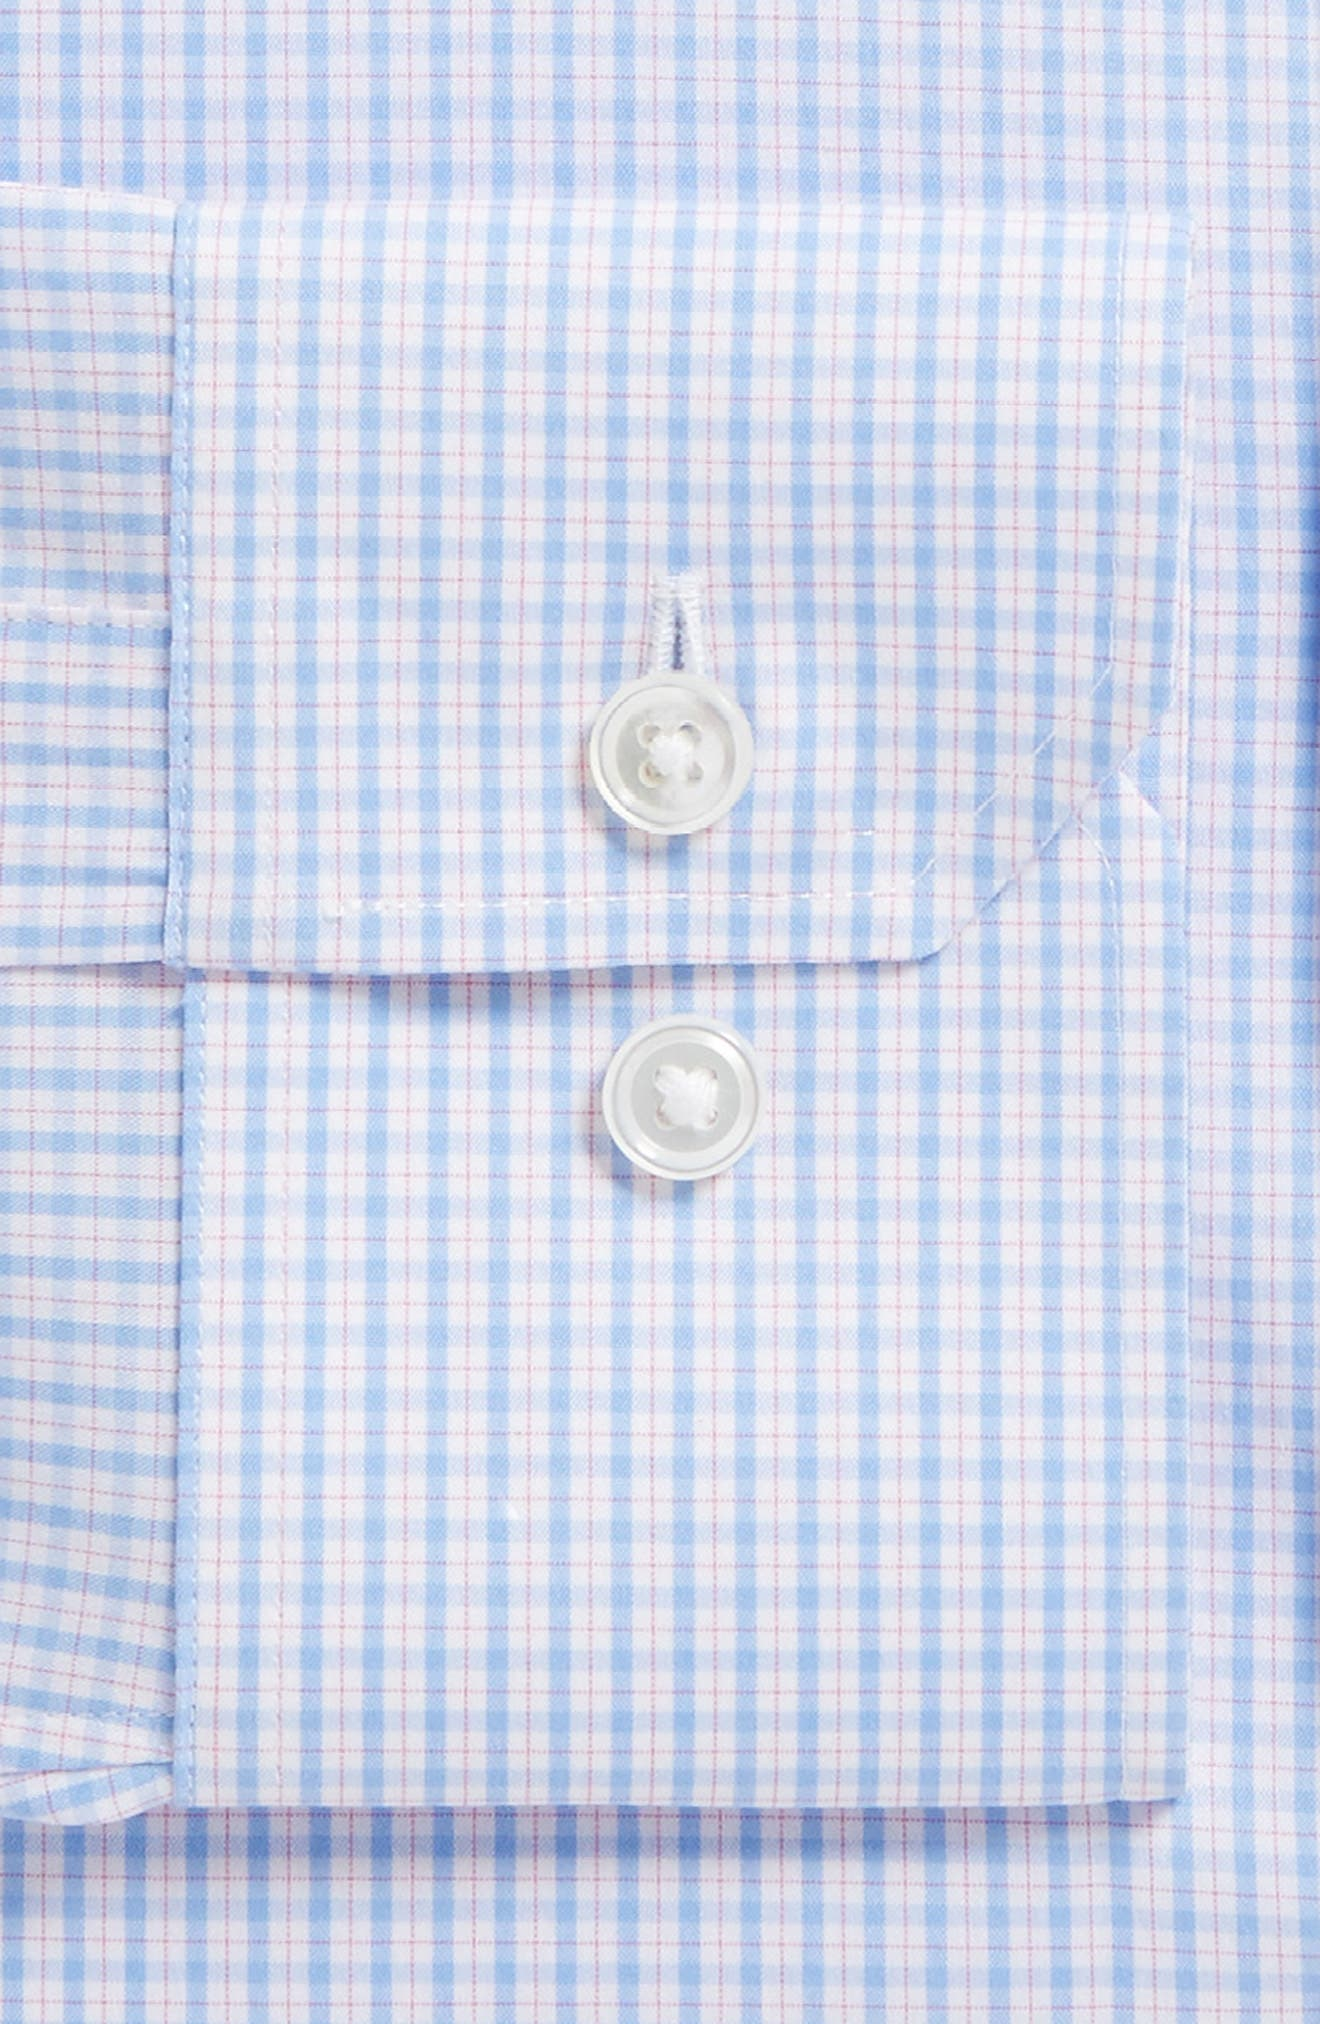 Soundview Slim Fit Stretch Check Dress Shirt,                             Alternate thumbnail 6, color,                             400